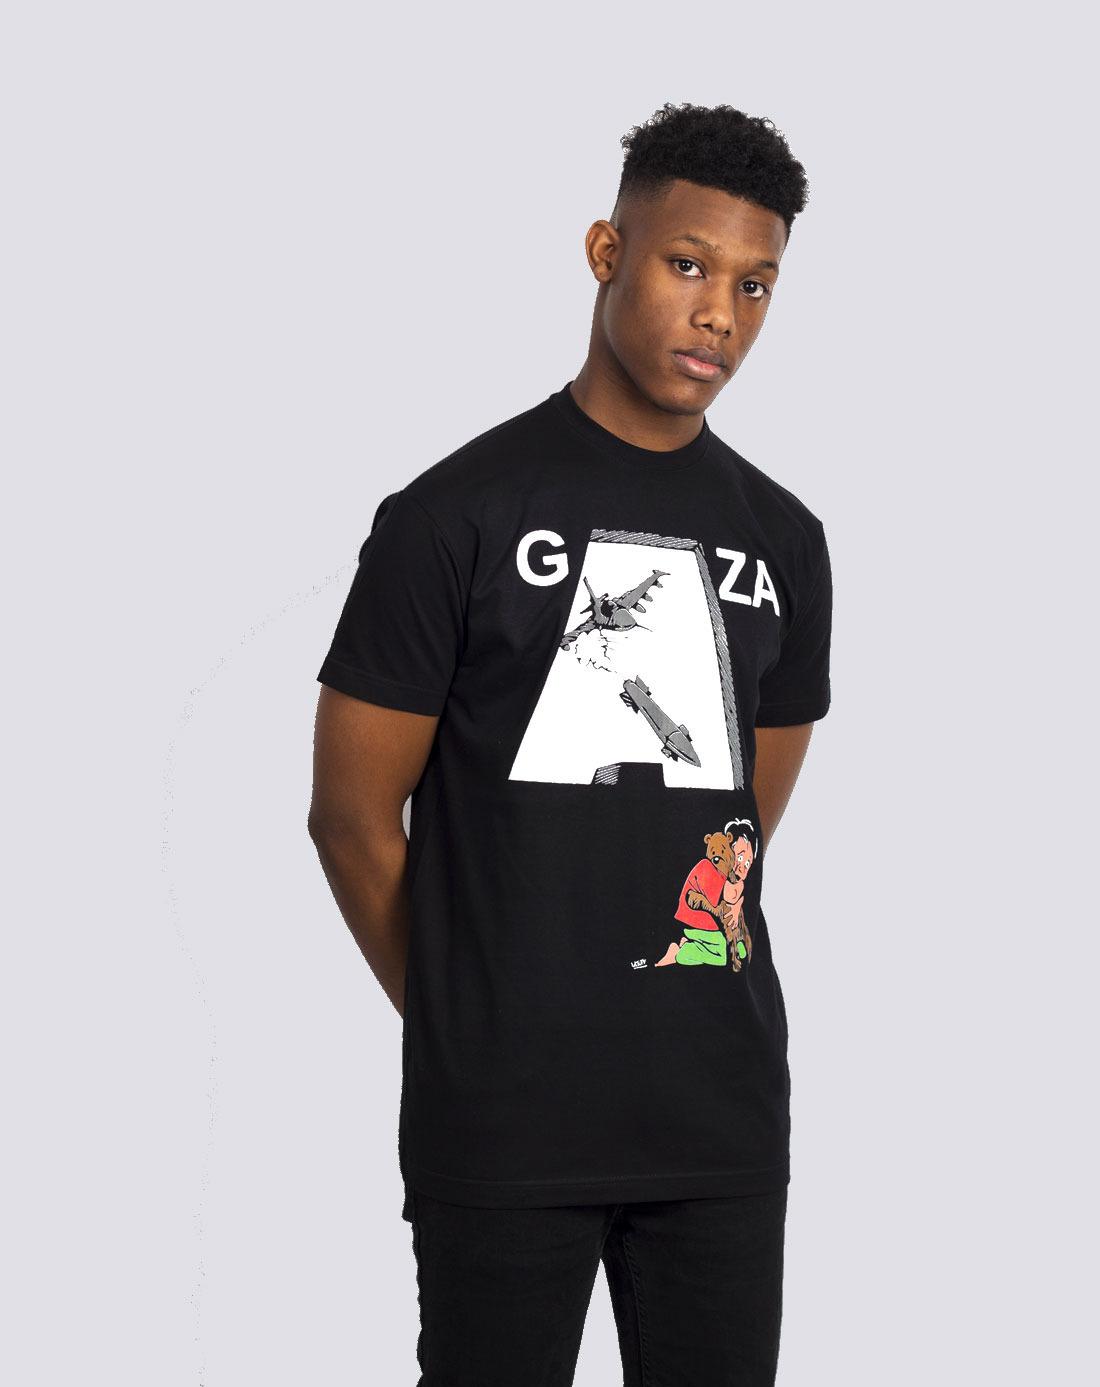 026b8ed390b Free Palestine T Shirt Uk | Toffee Art